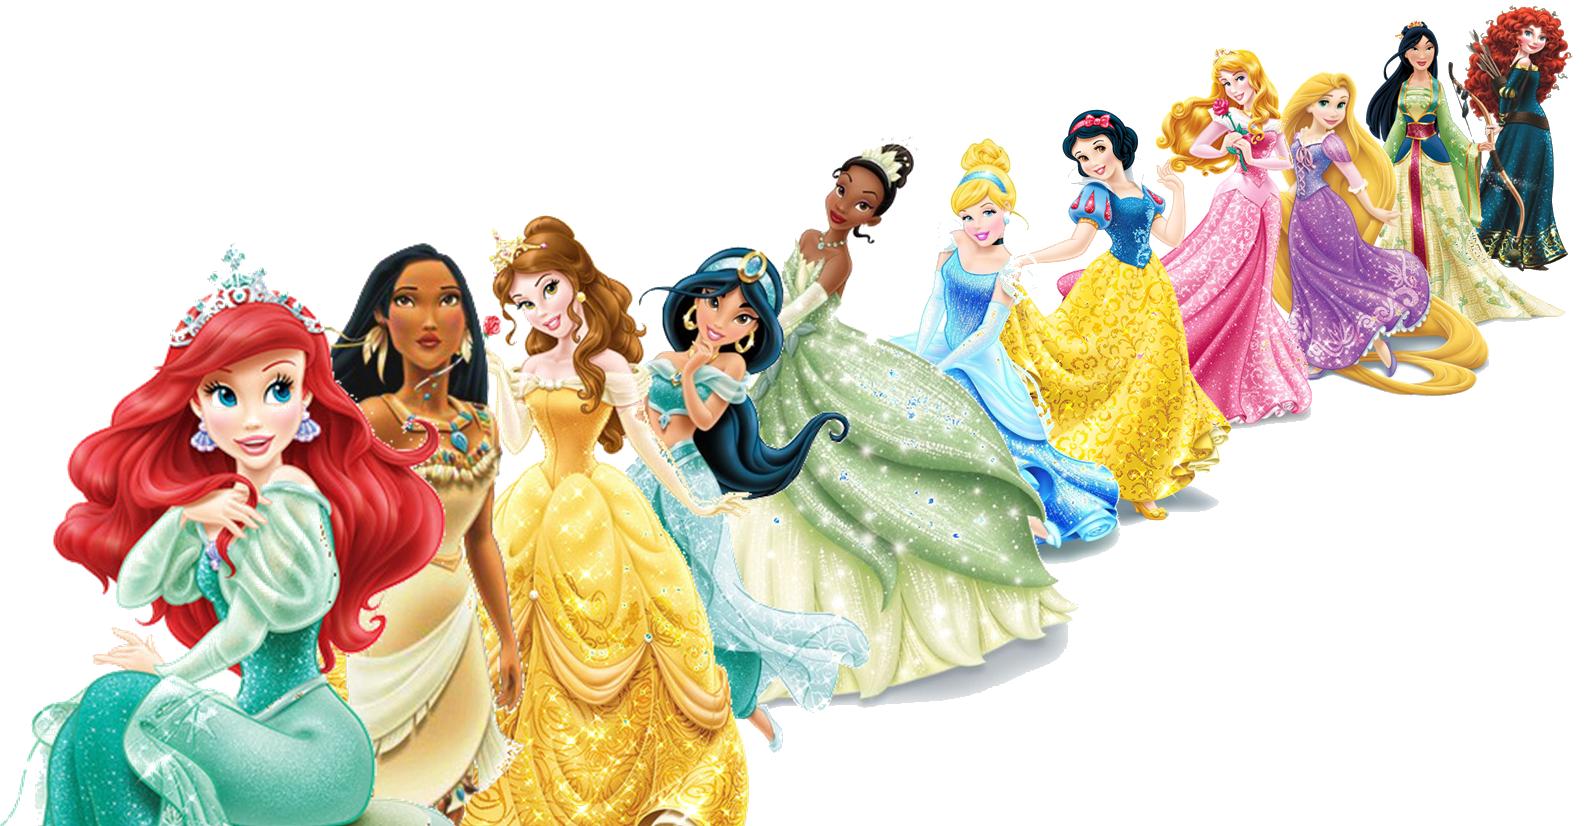 Disney Princesses PNG Transparent Disney Princesses.PNG Images.